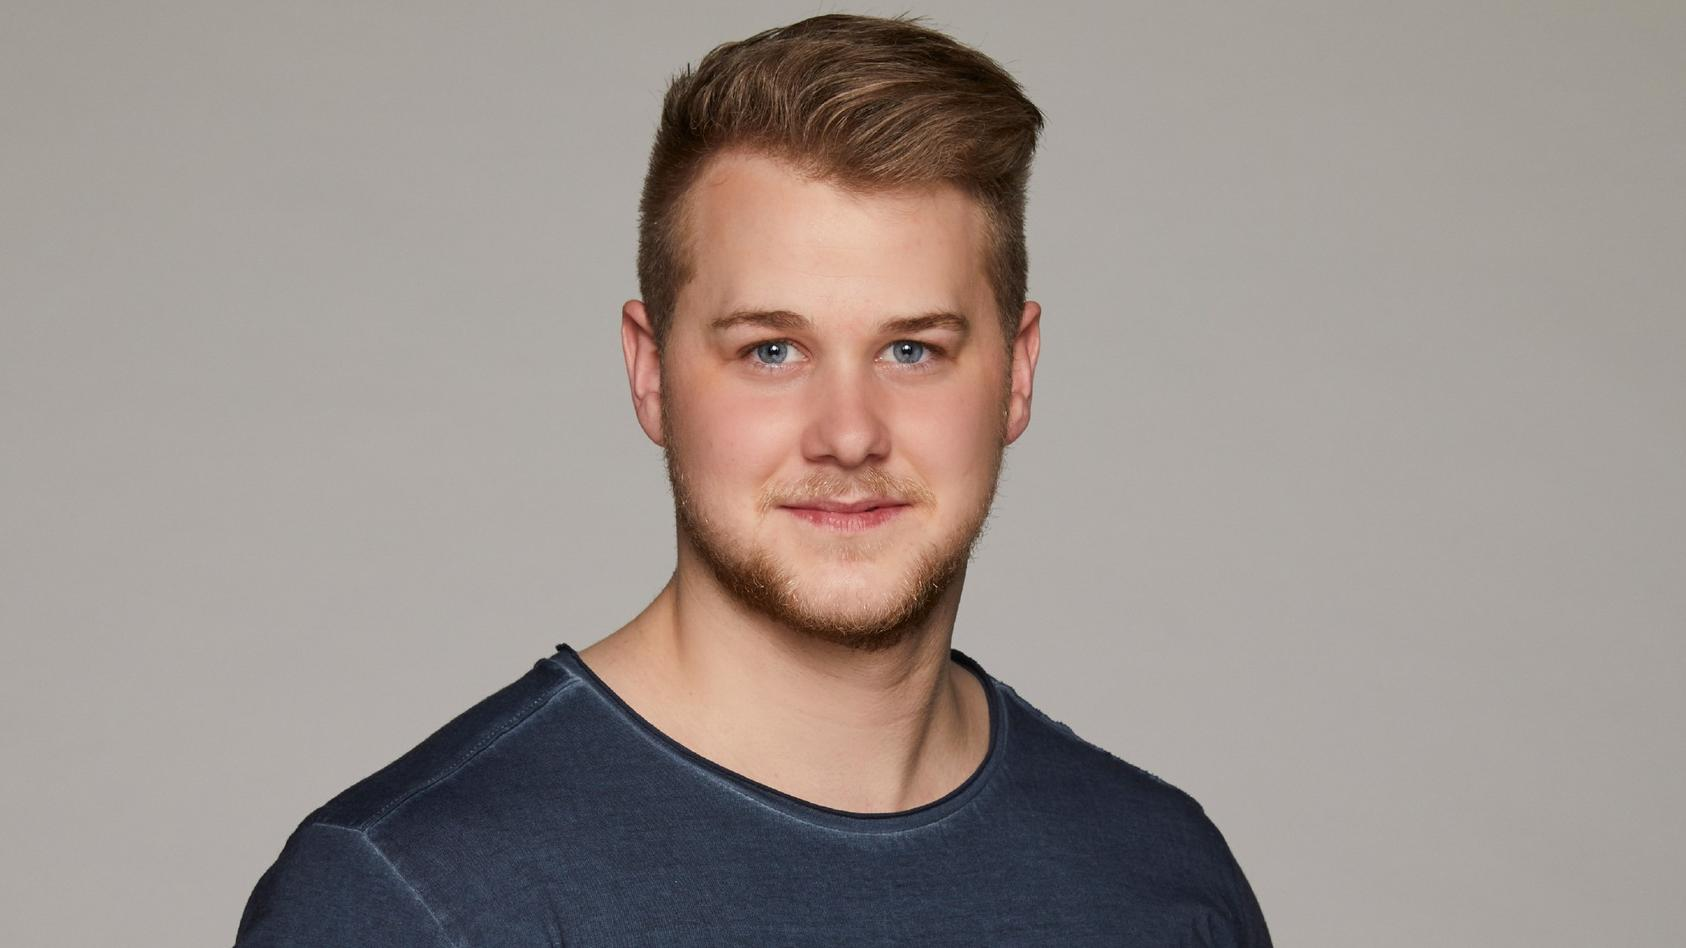 Felix van Deventer hat sich optisch extrem verändert.